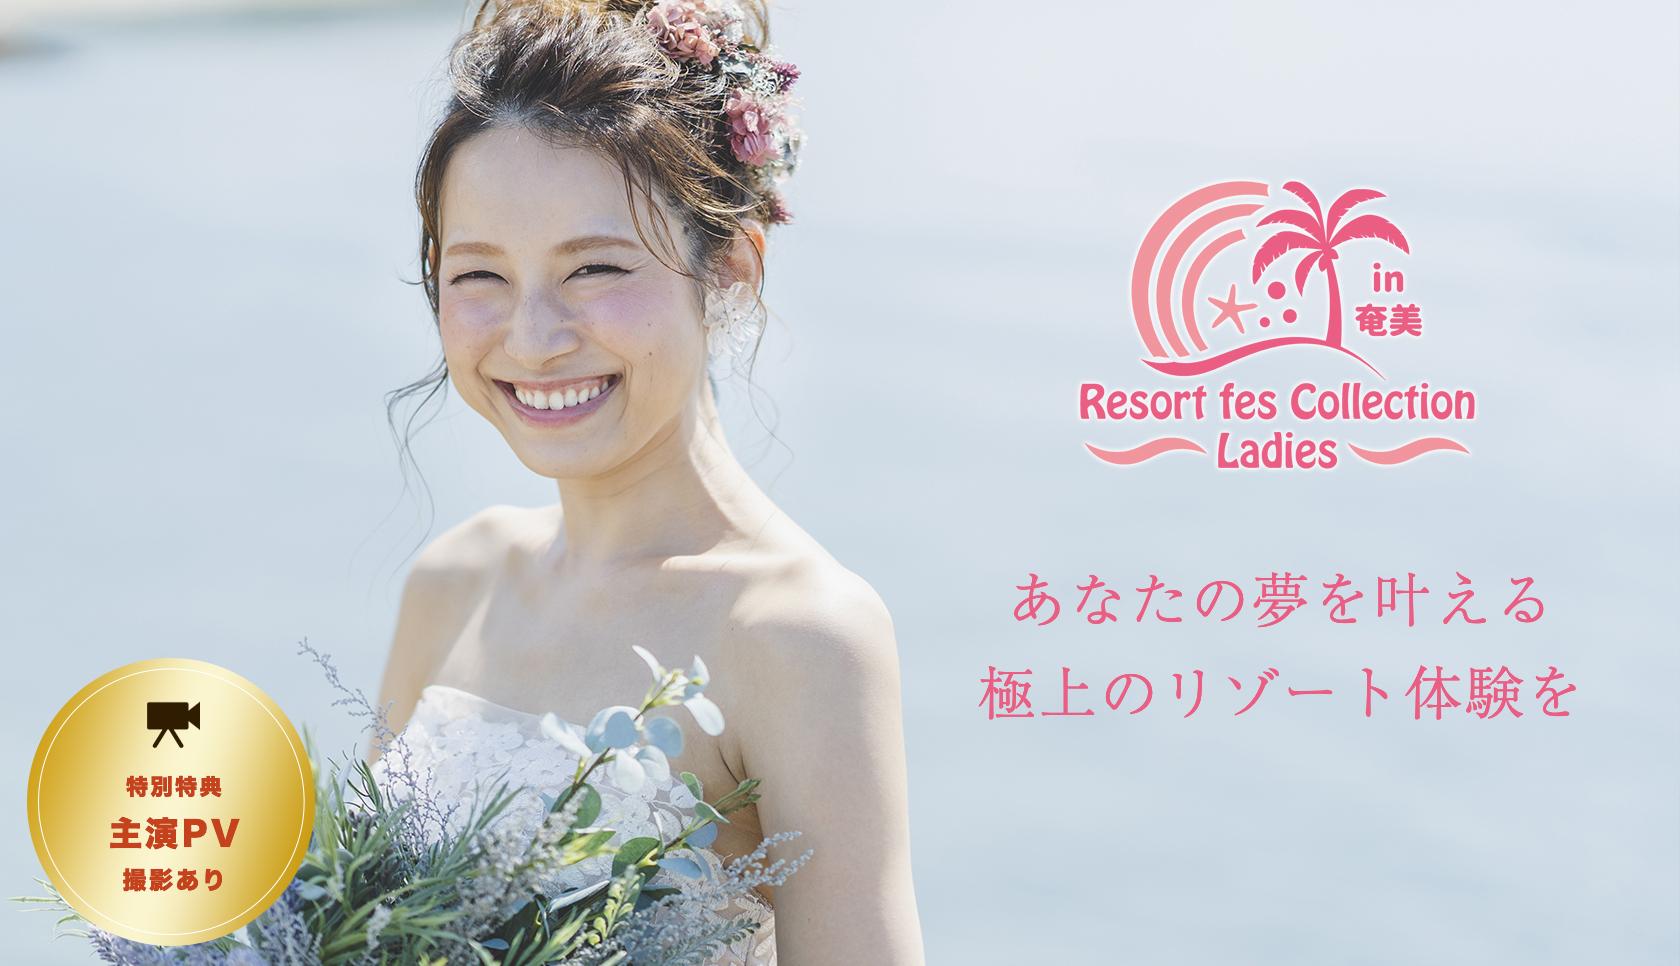 Resort fes Collection in奄美 -Ladies-メイン画像